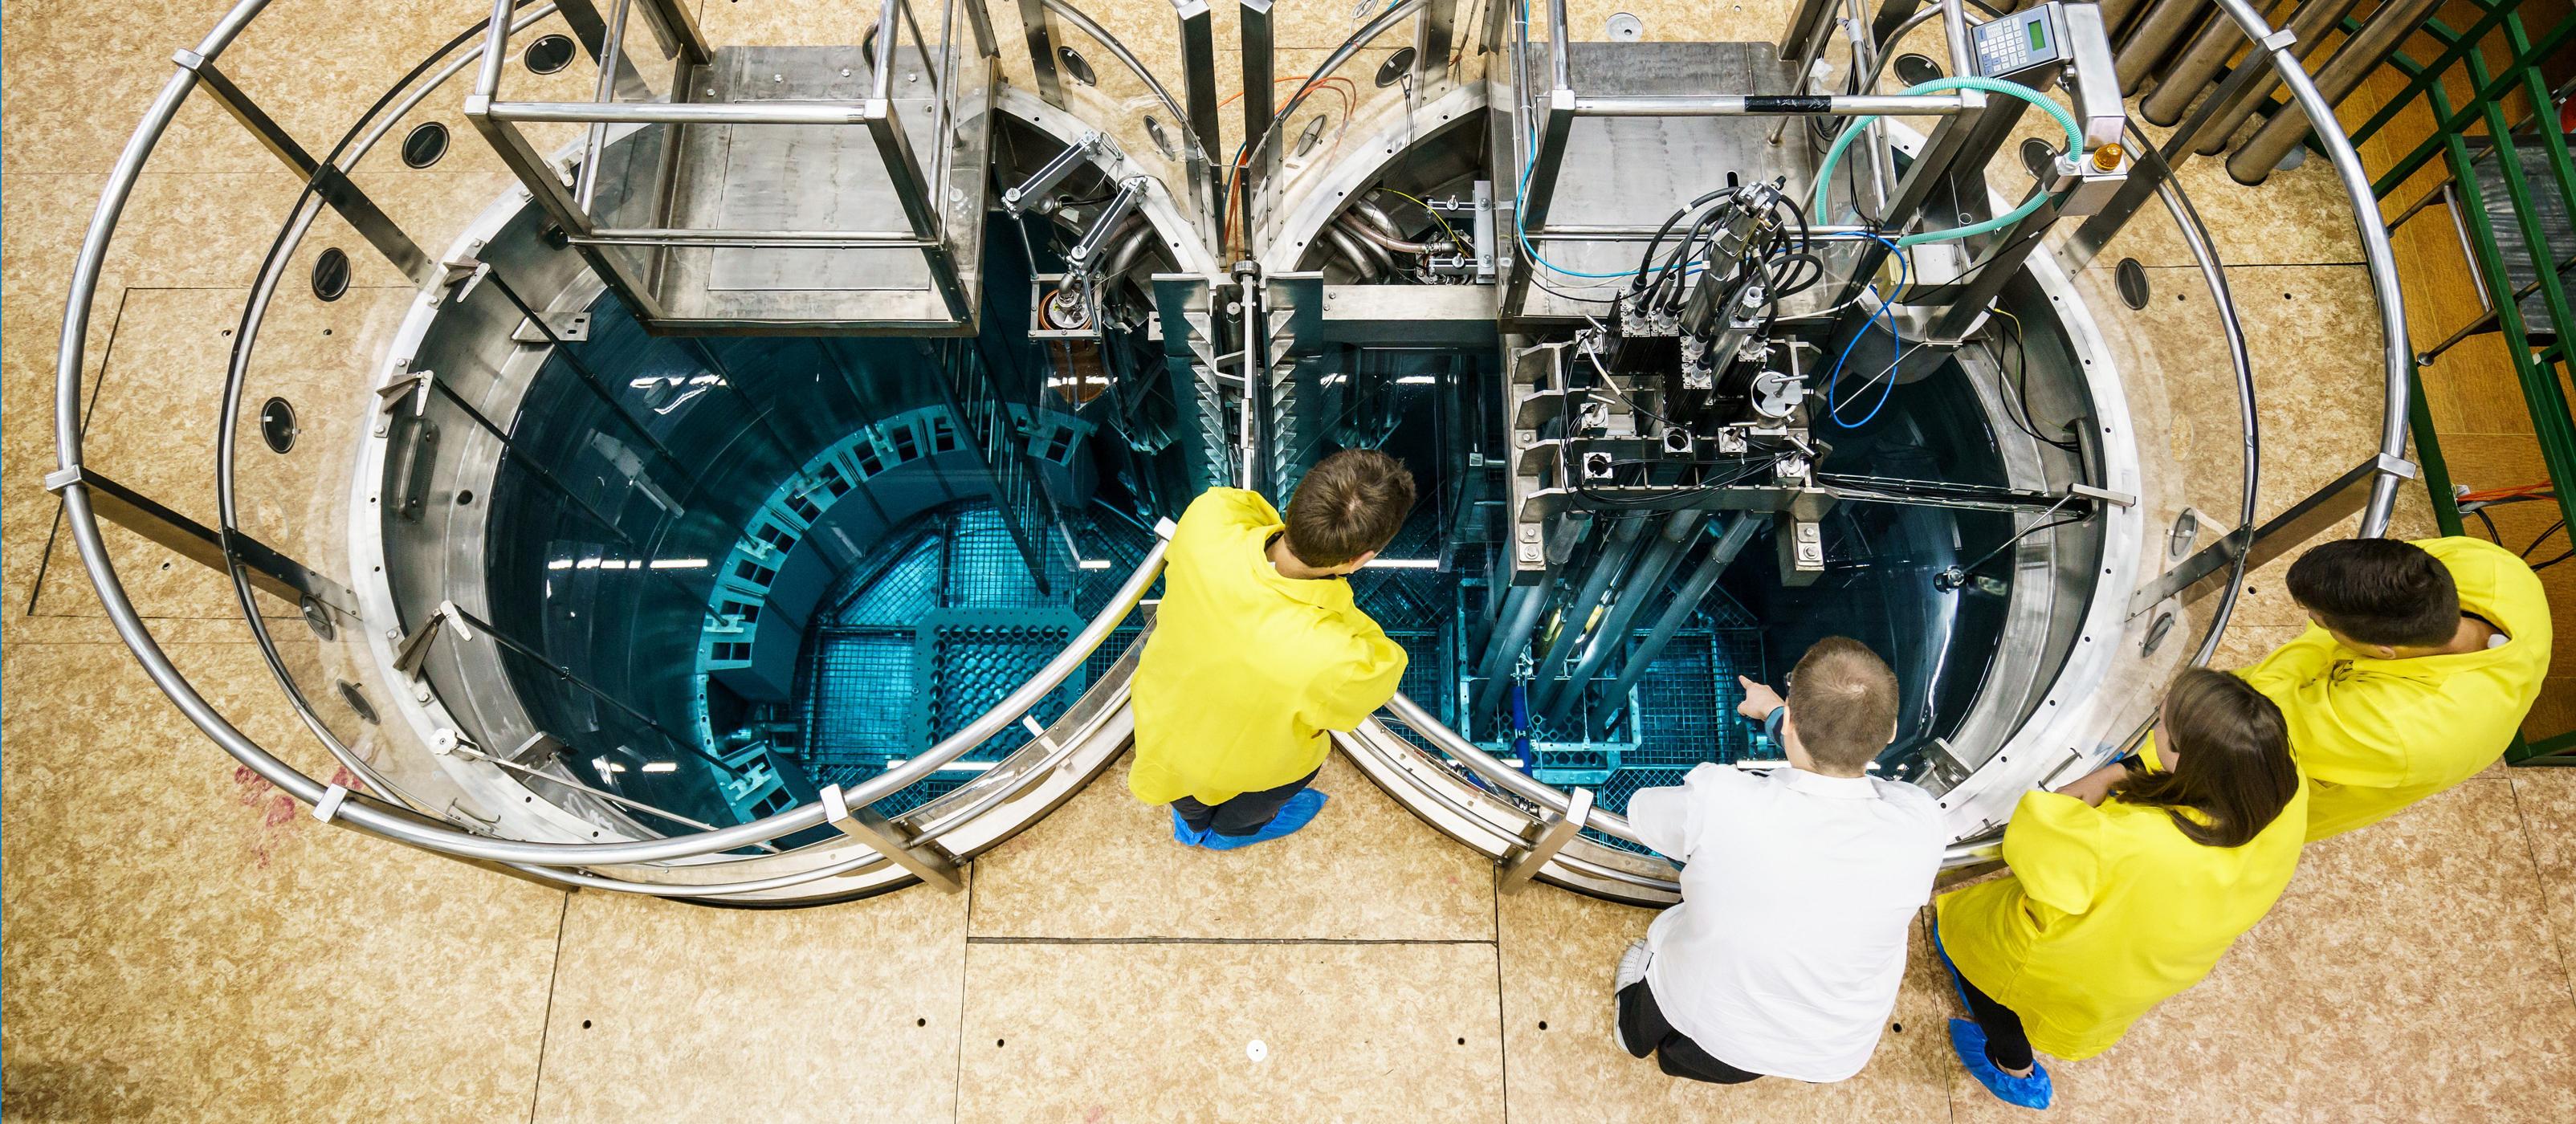 Nuclear reactor VR-1